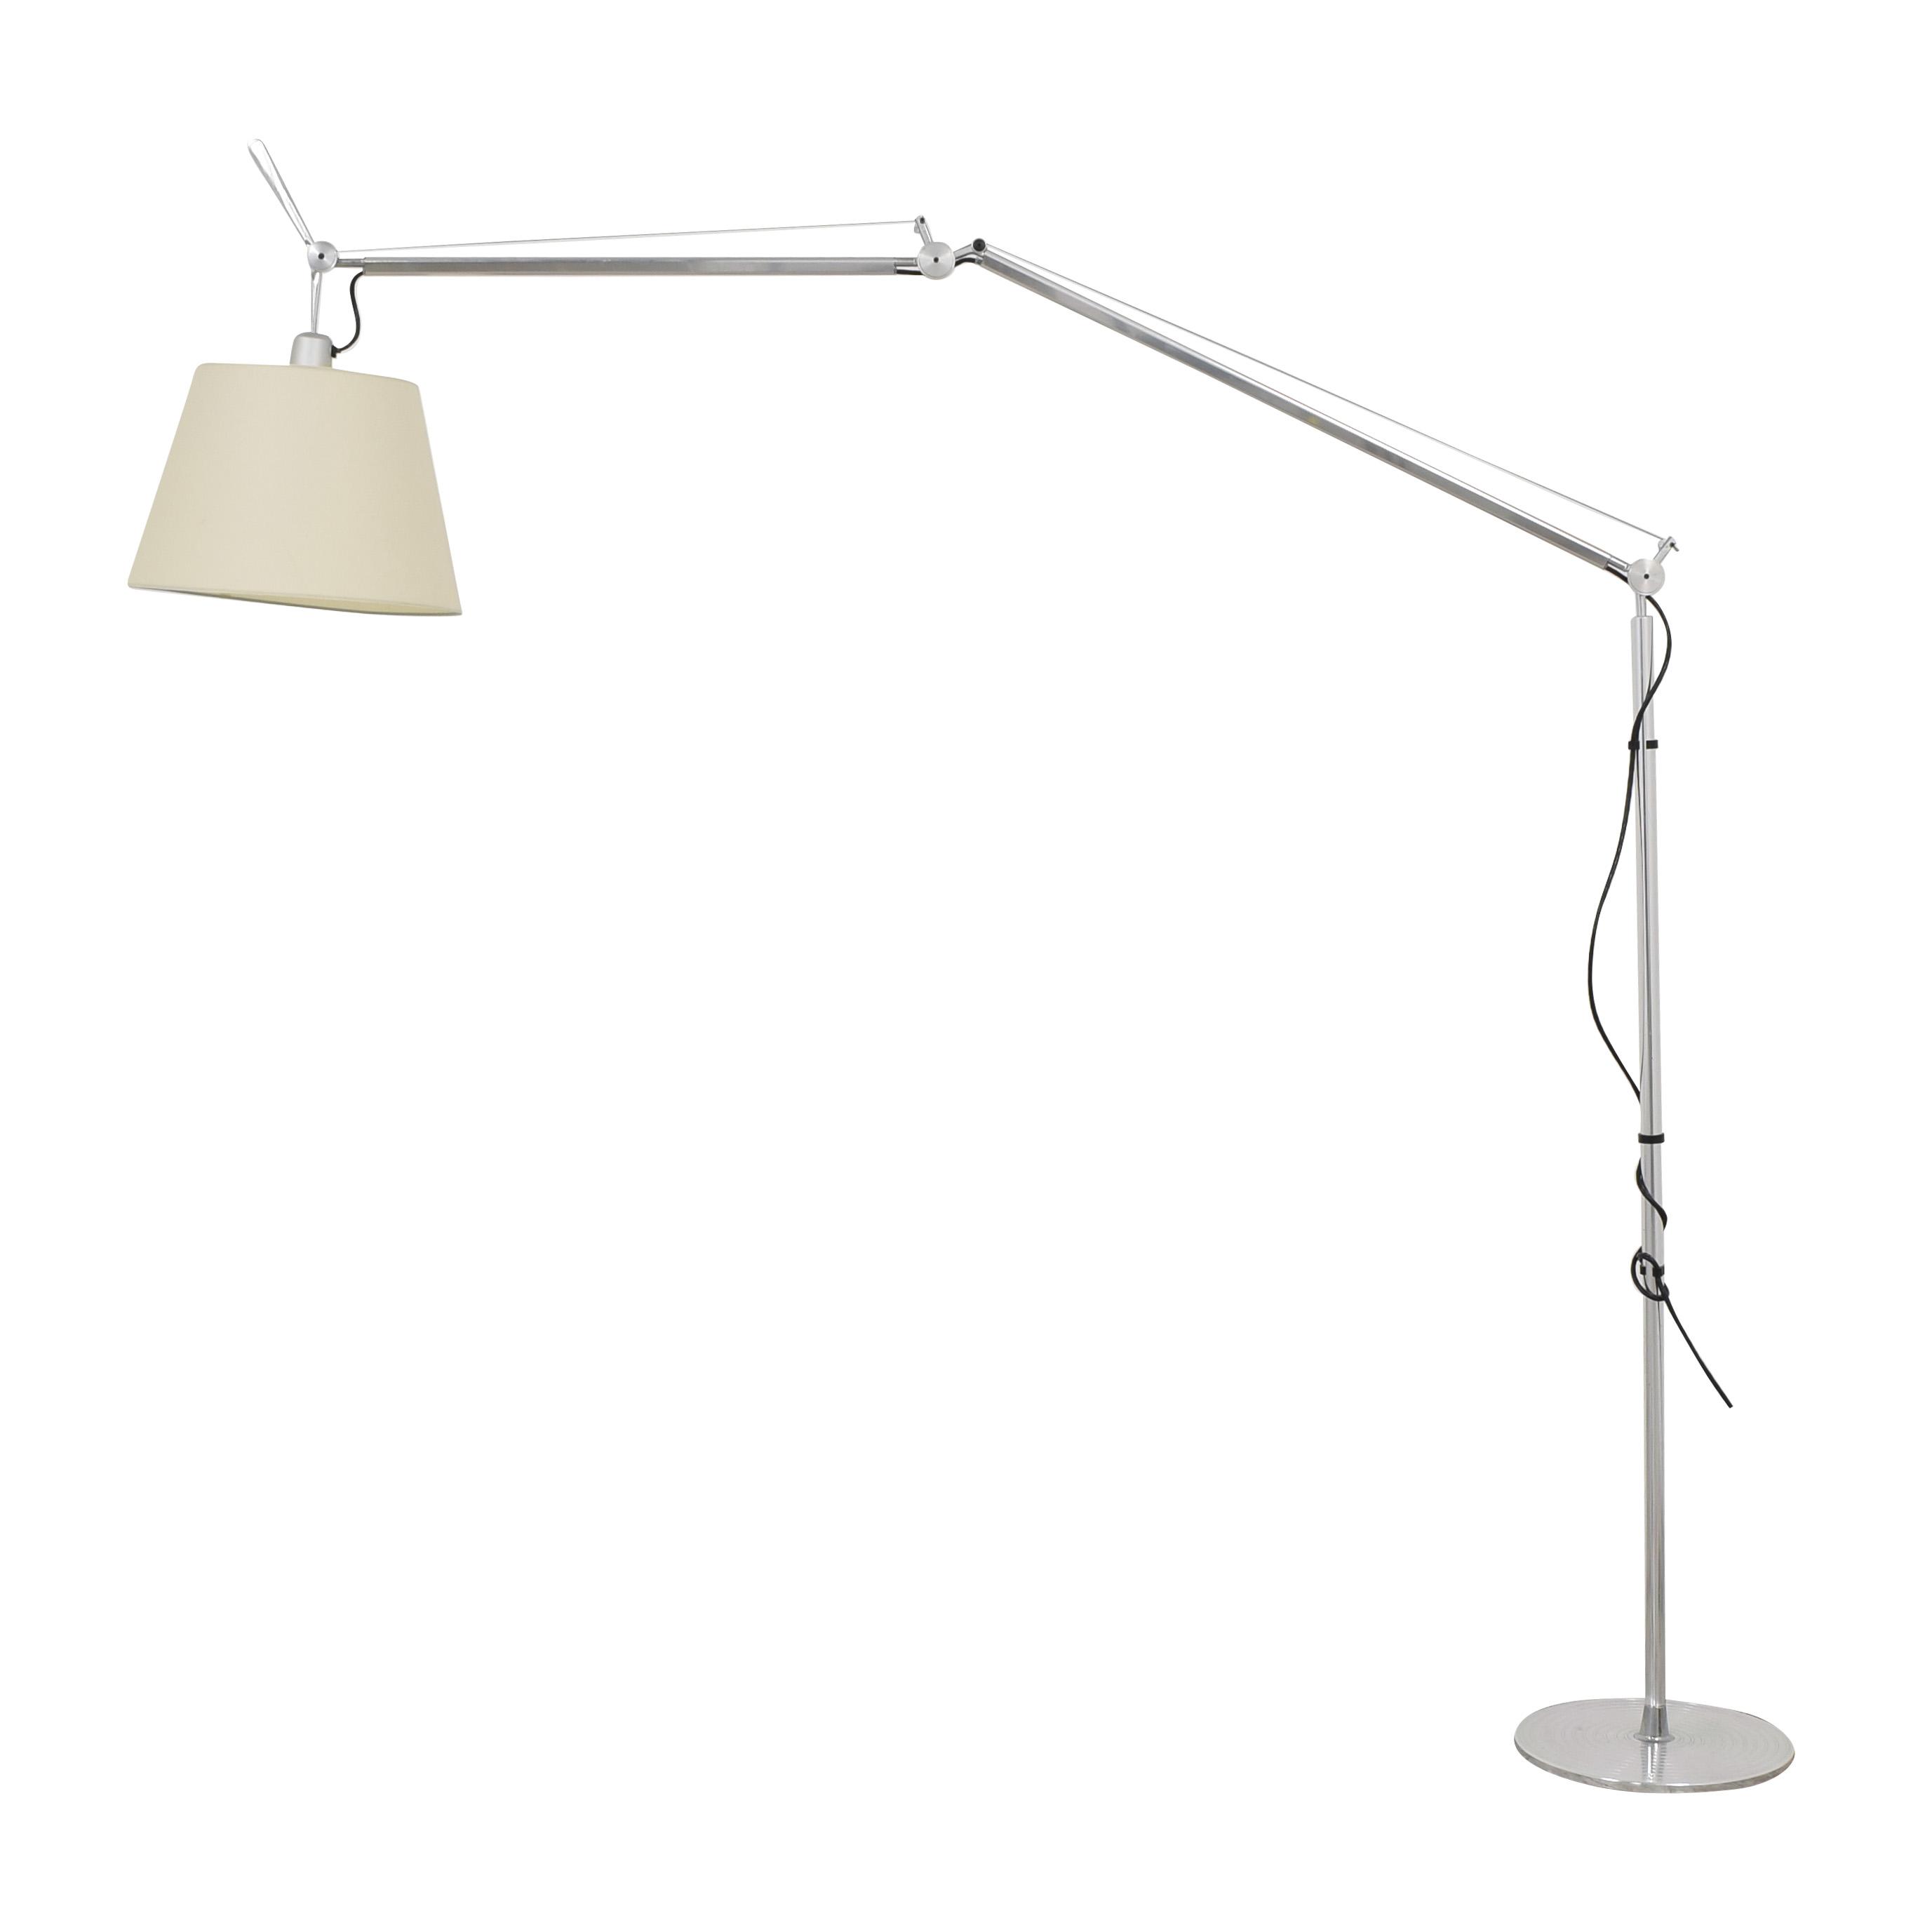 Artemide Tolomeo Mega Floor Lamp / Decor